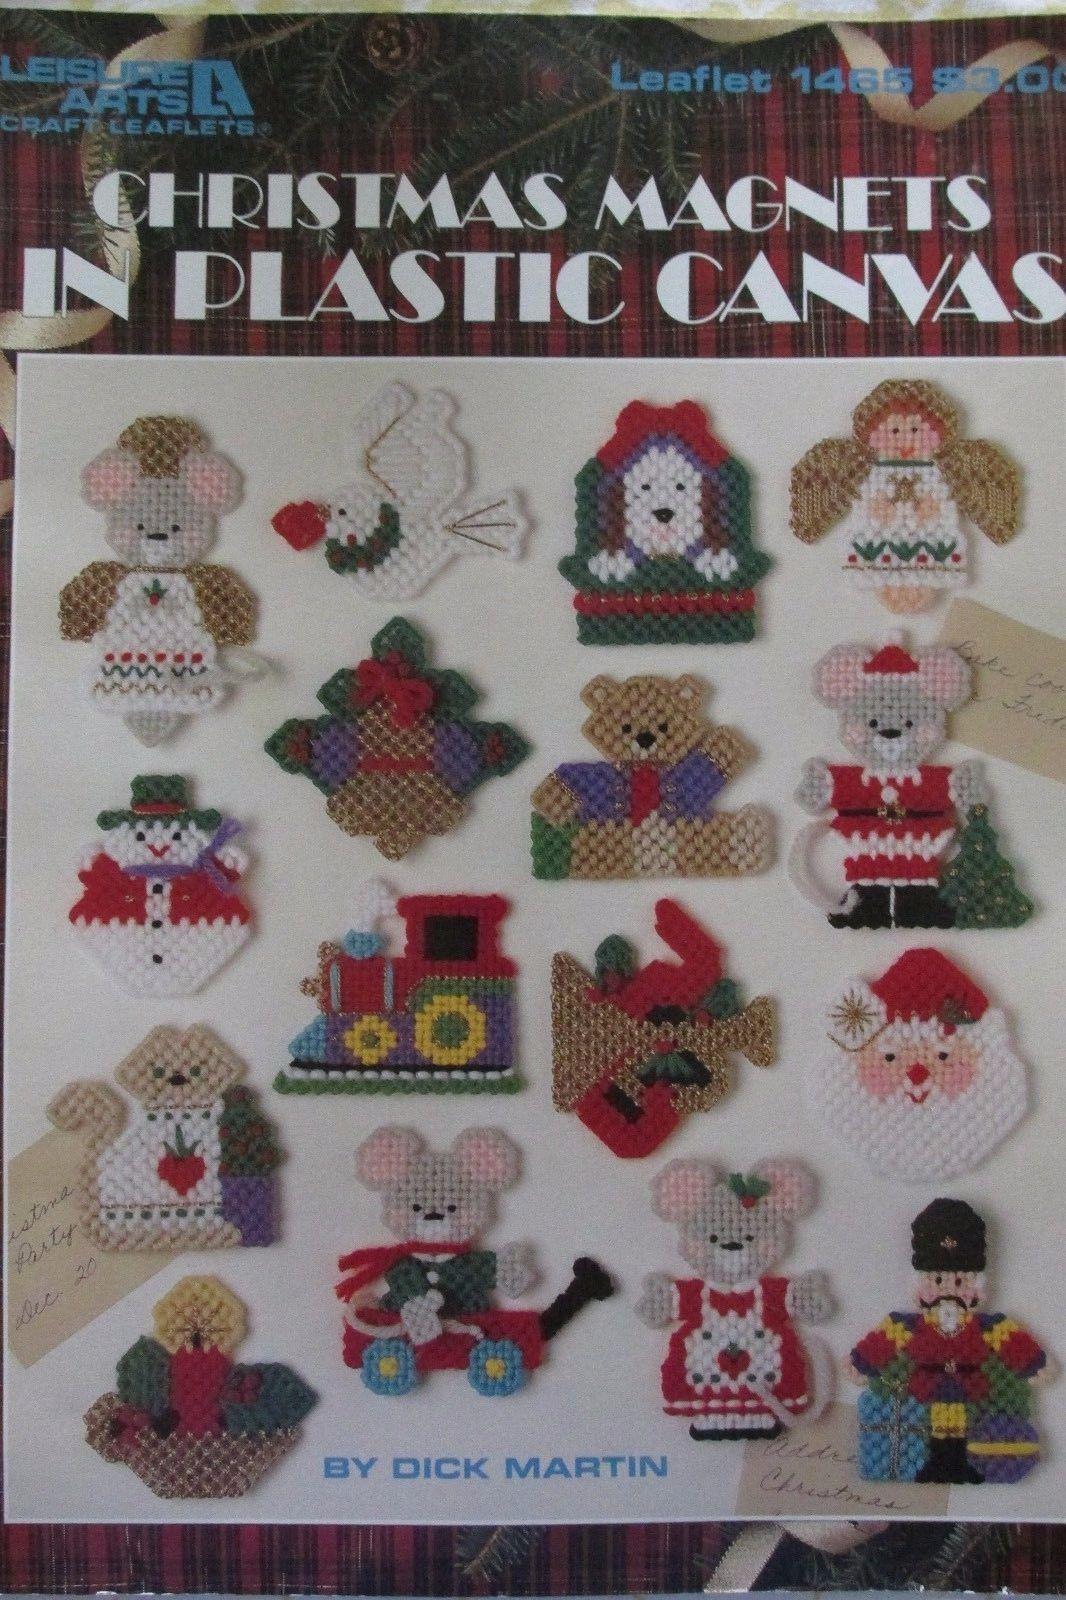 Leisure arts dick martin plastic canvas designs